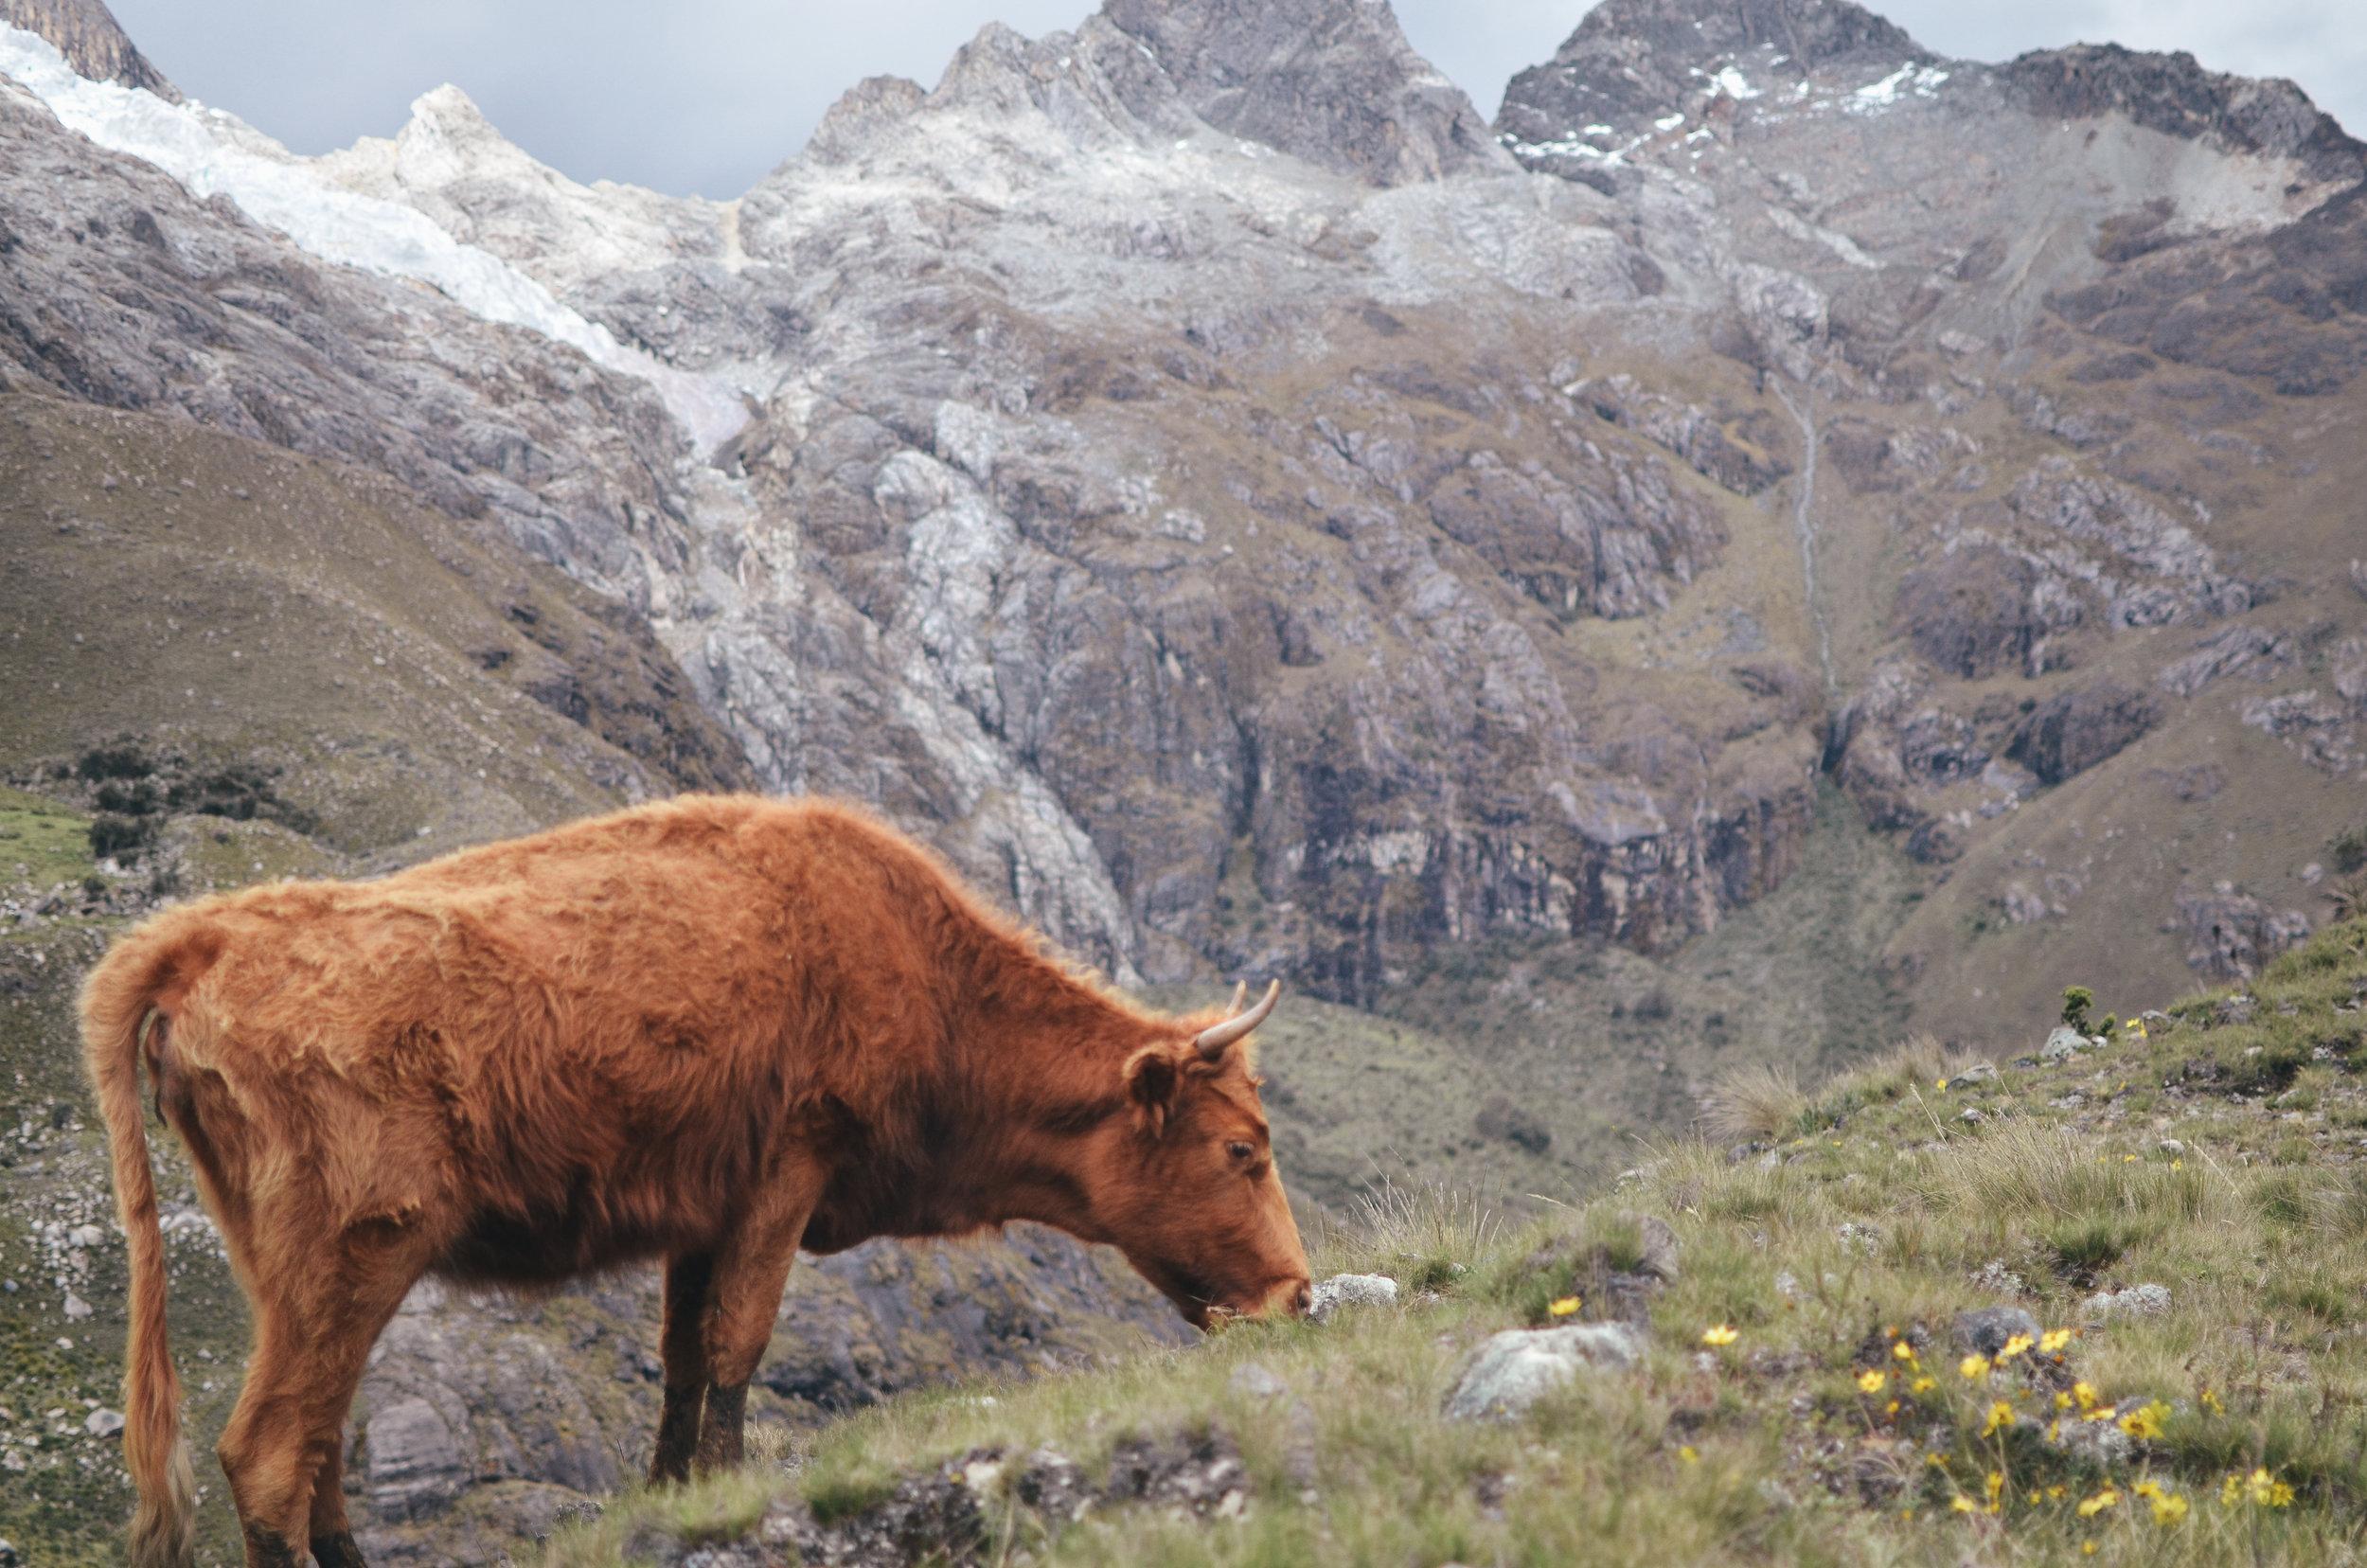 laguna+lake+69+hike+peru+travel+guide+life+on+pine_DSC_0633.jpg